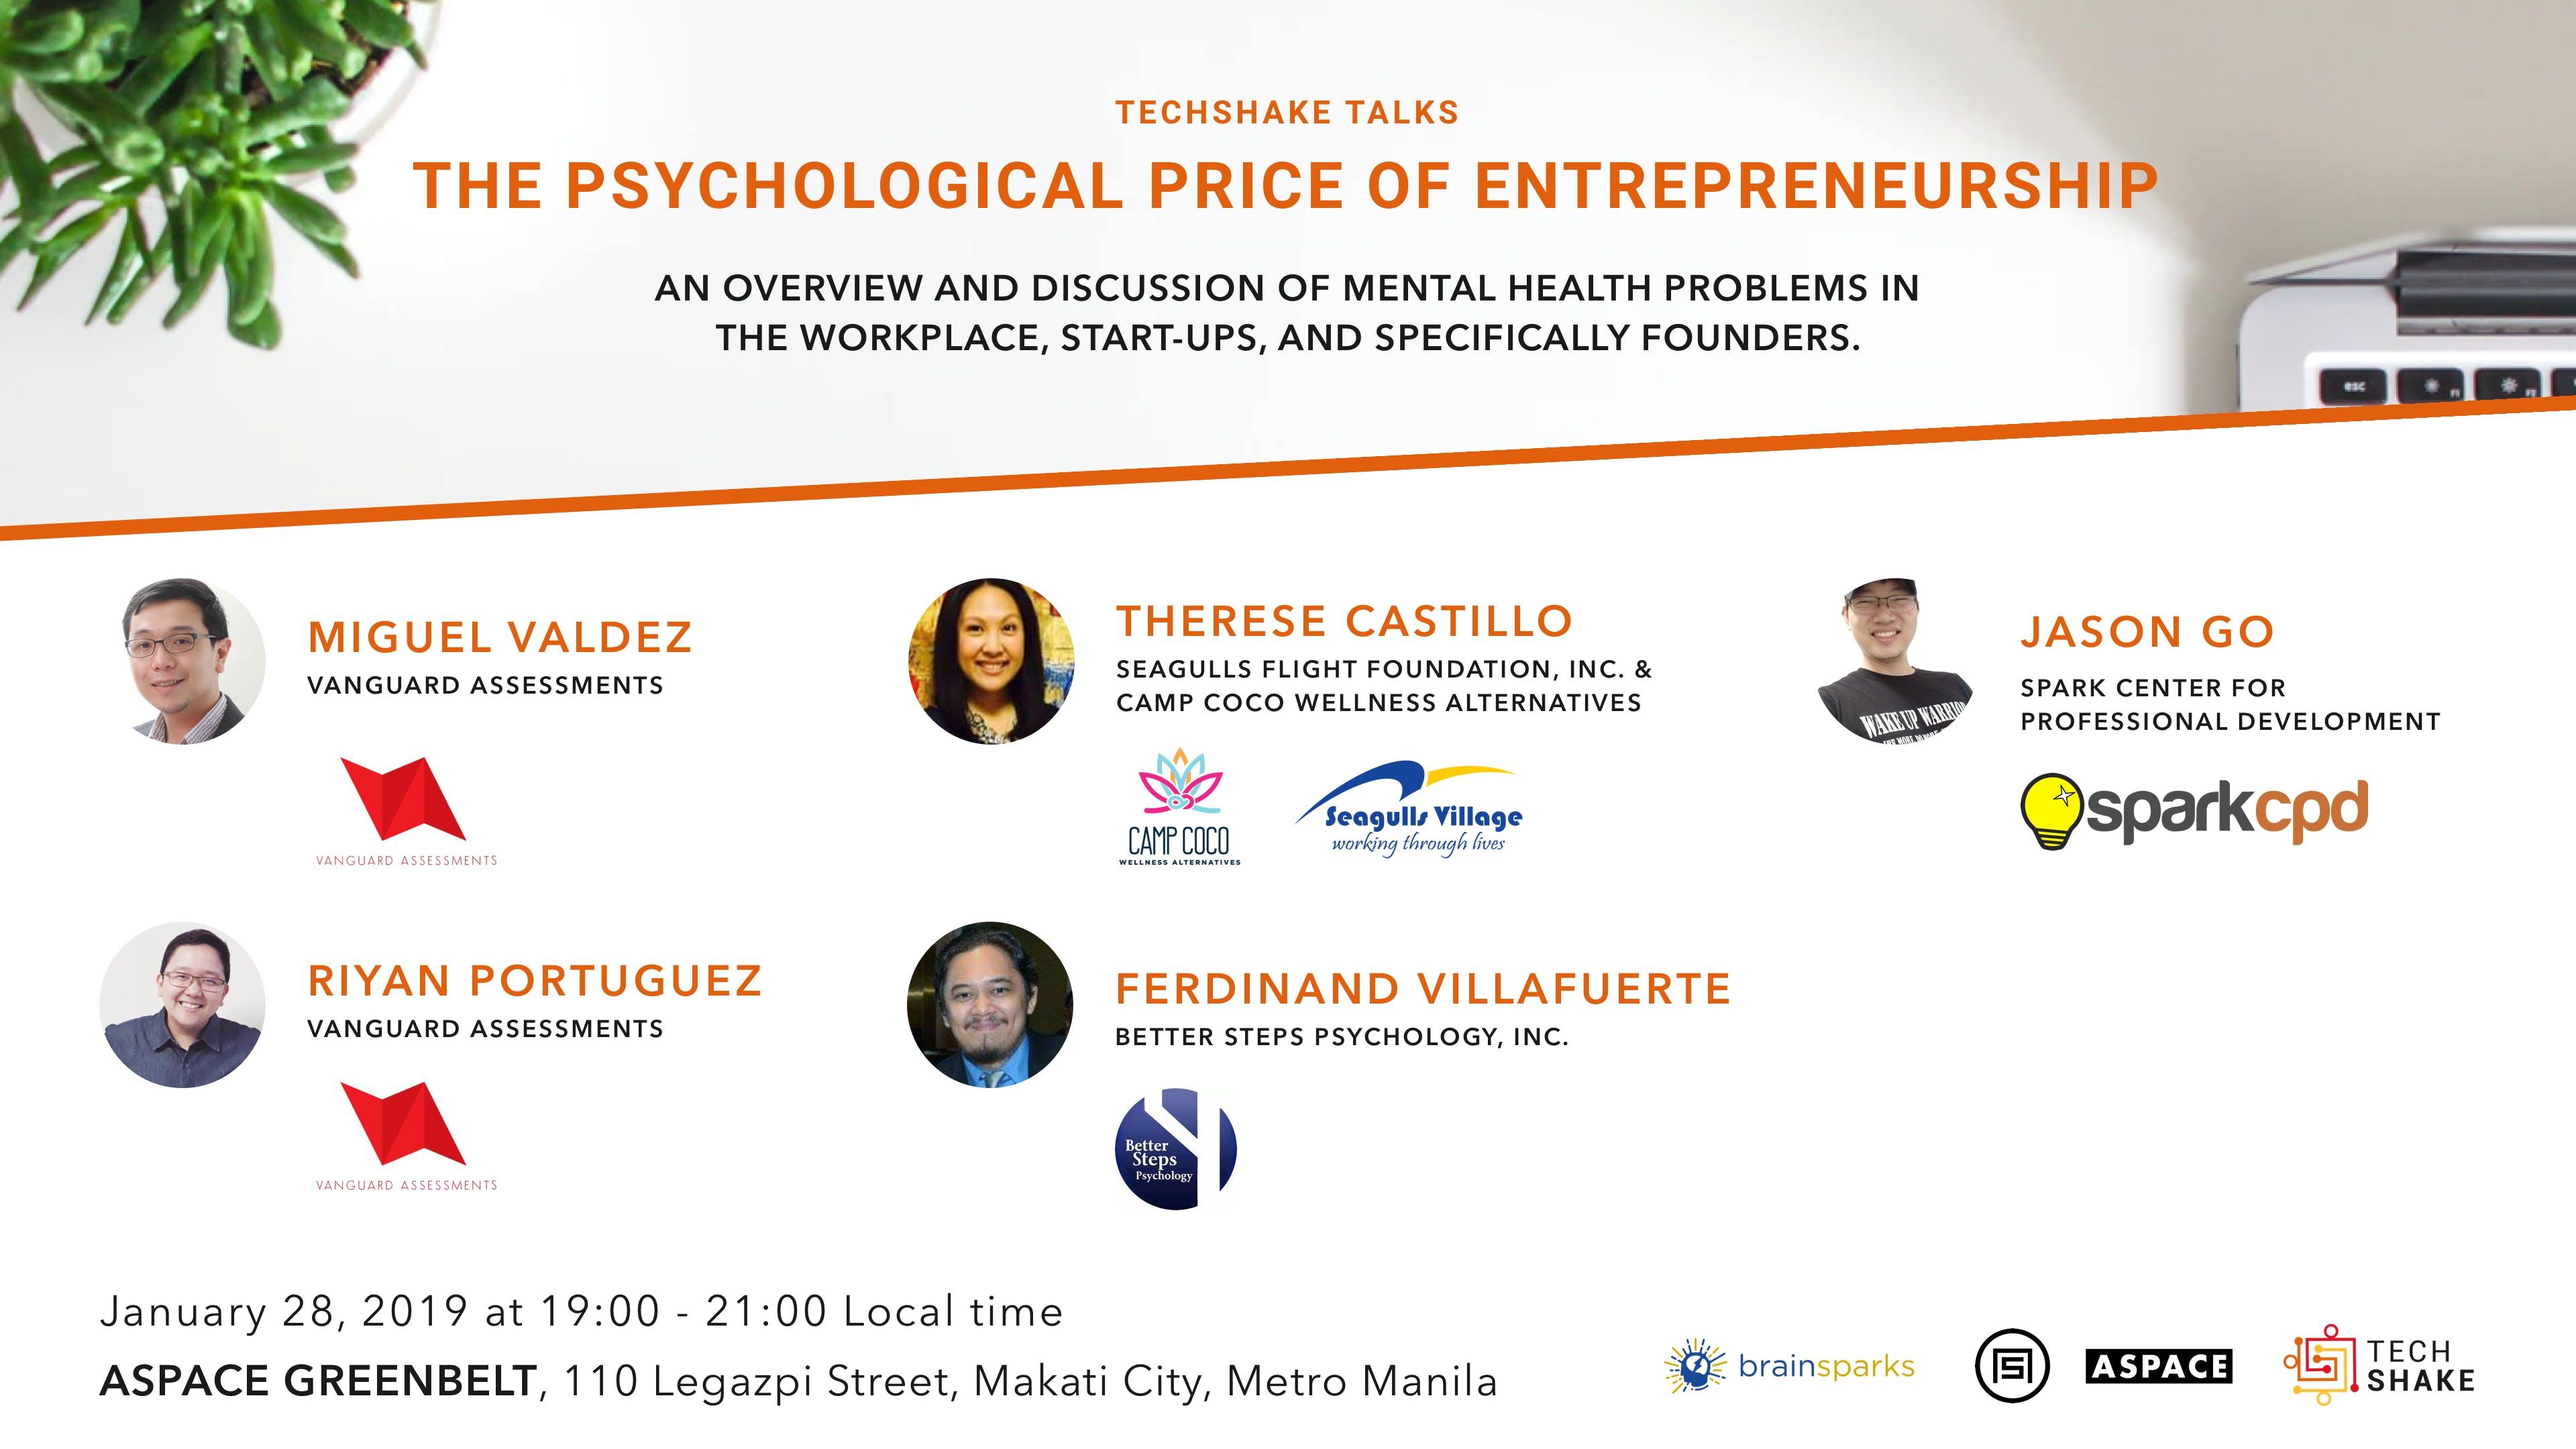 TechShake Talks: The Psychological Price of Entrepreneurship